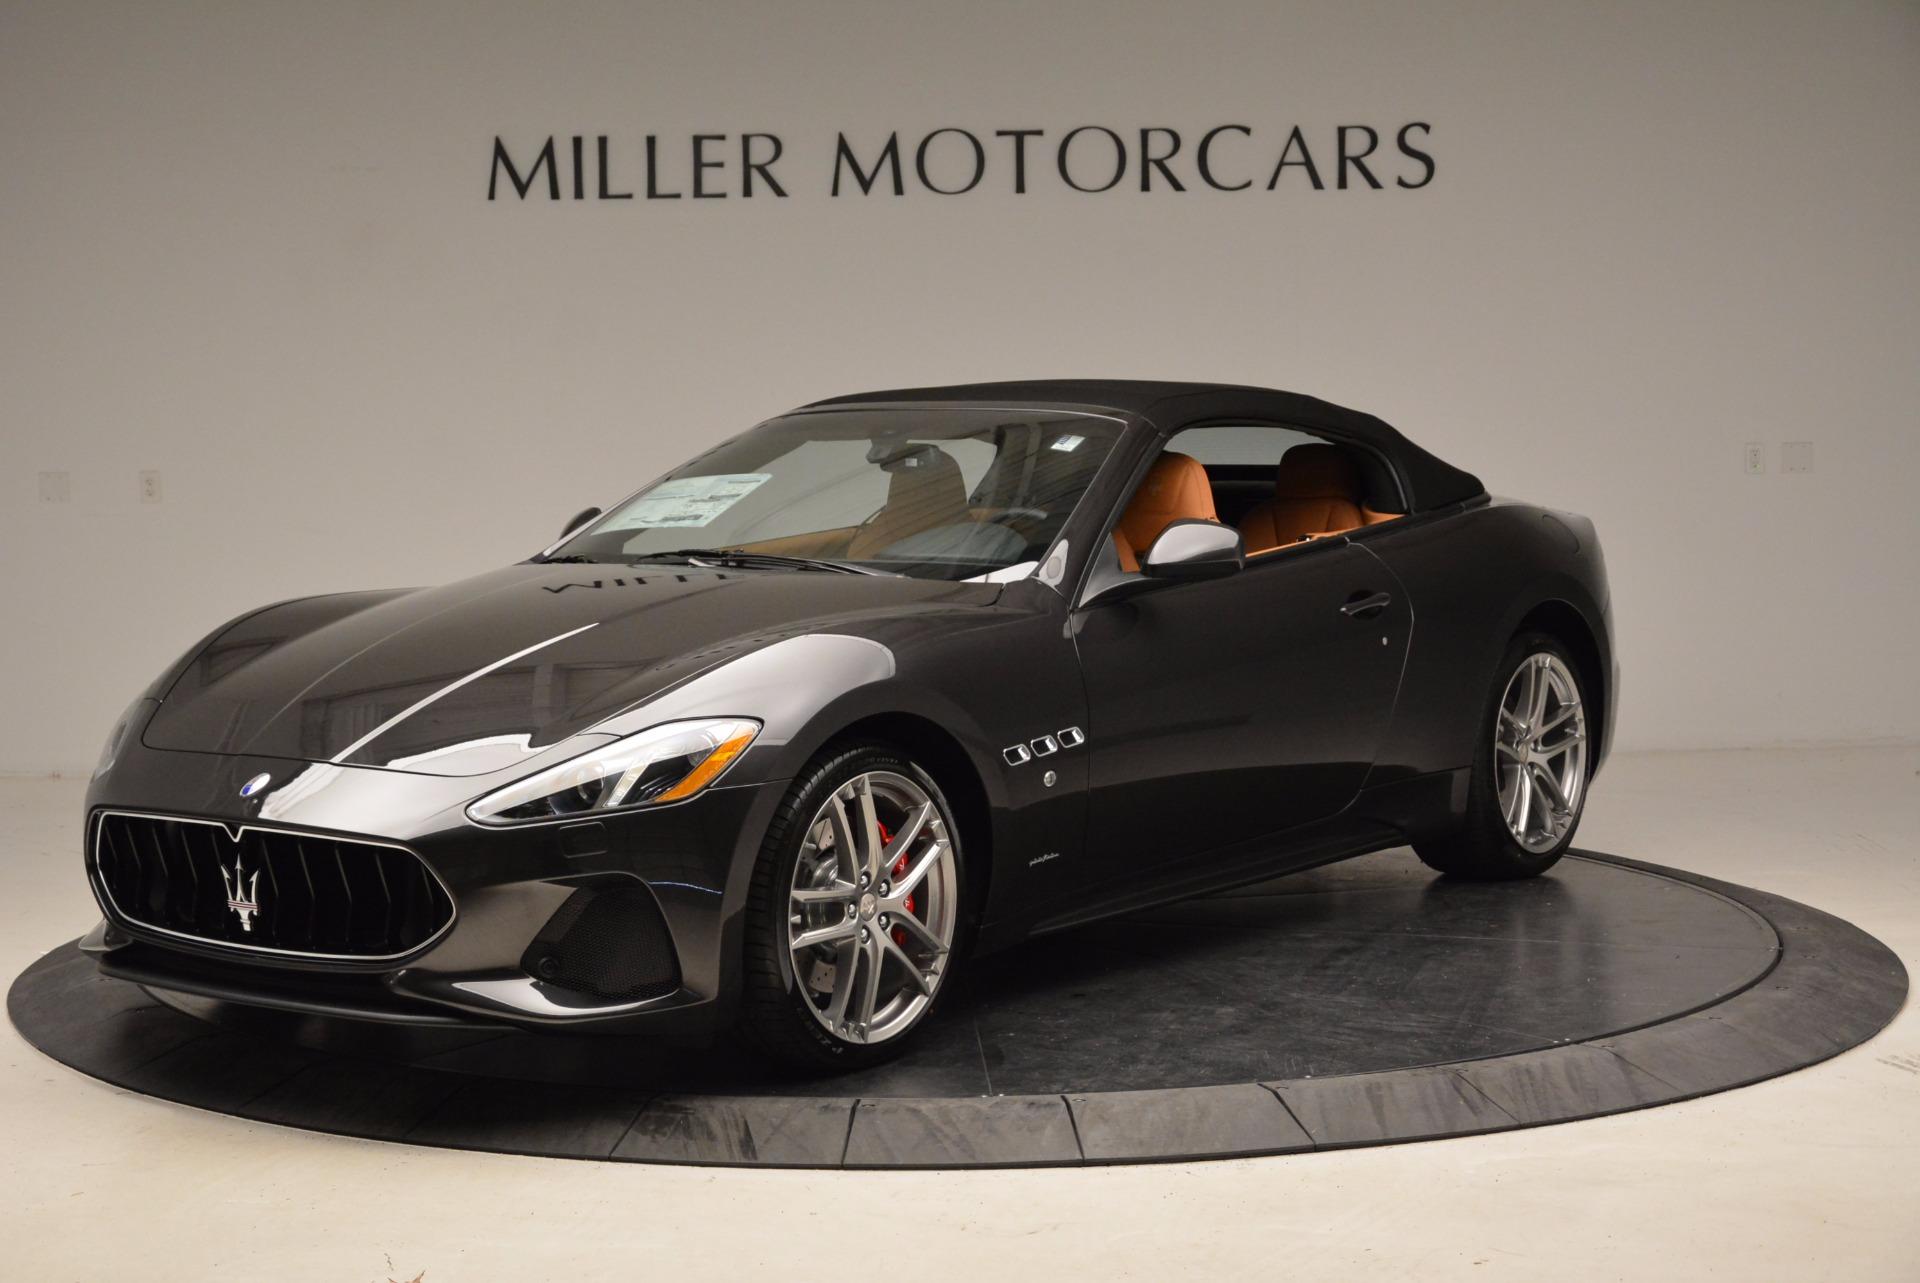 New 2018 Maserati GranTurismo Sport Convertible For Sale In Westport, CT 1869_p2